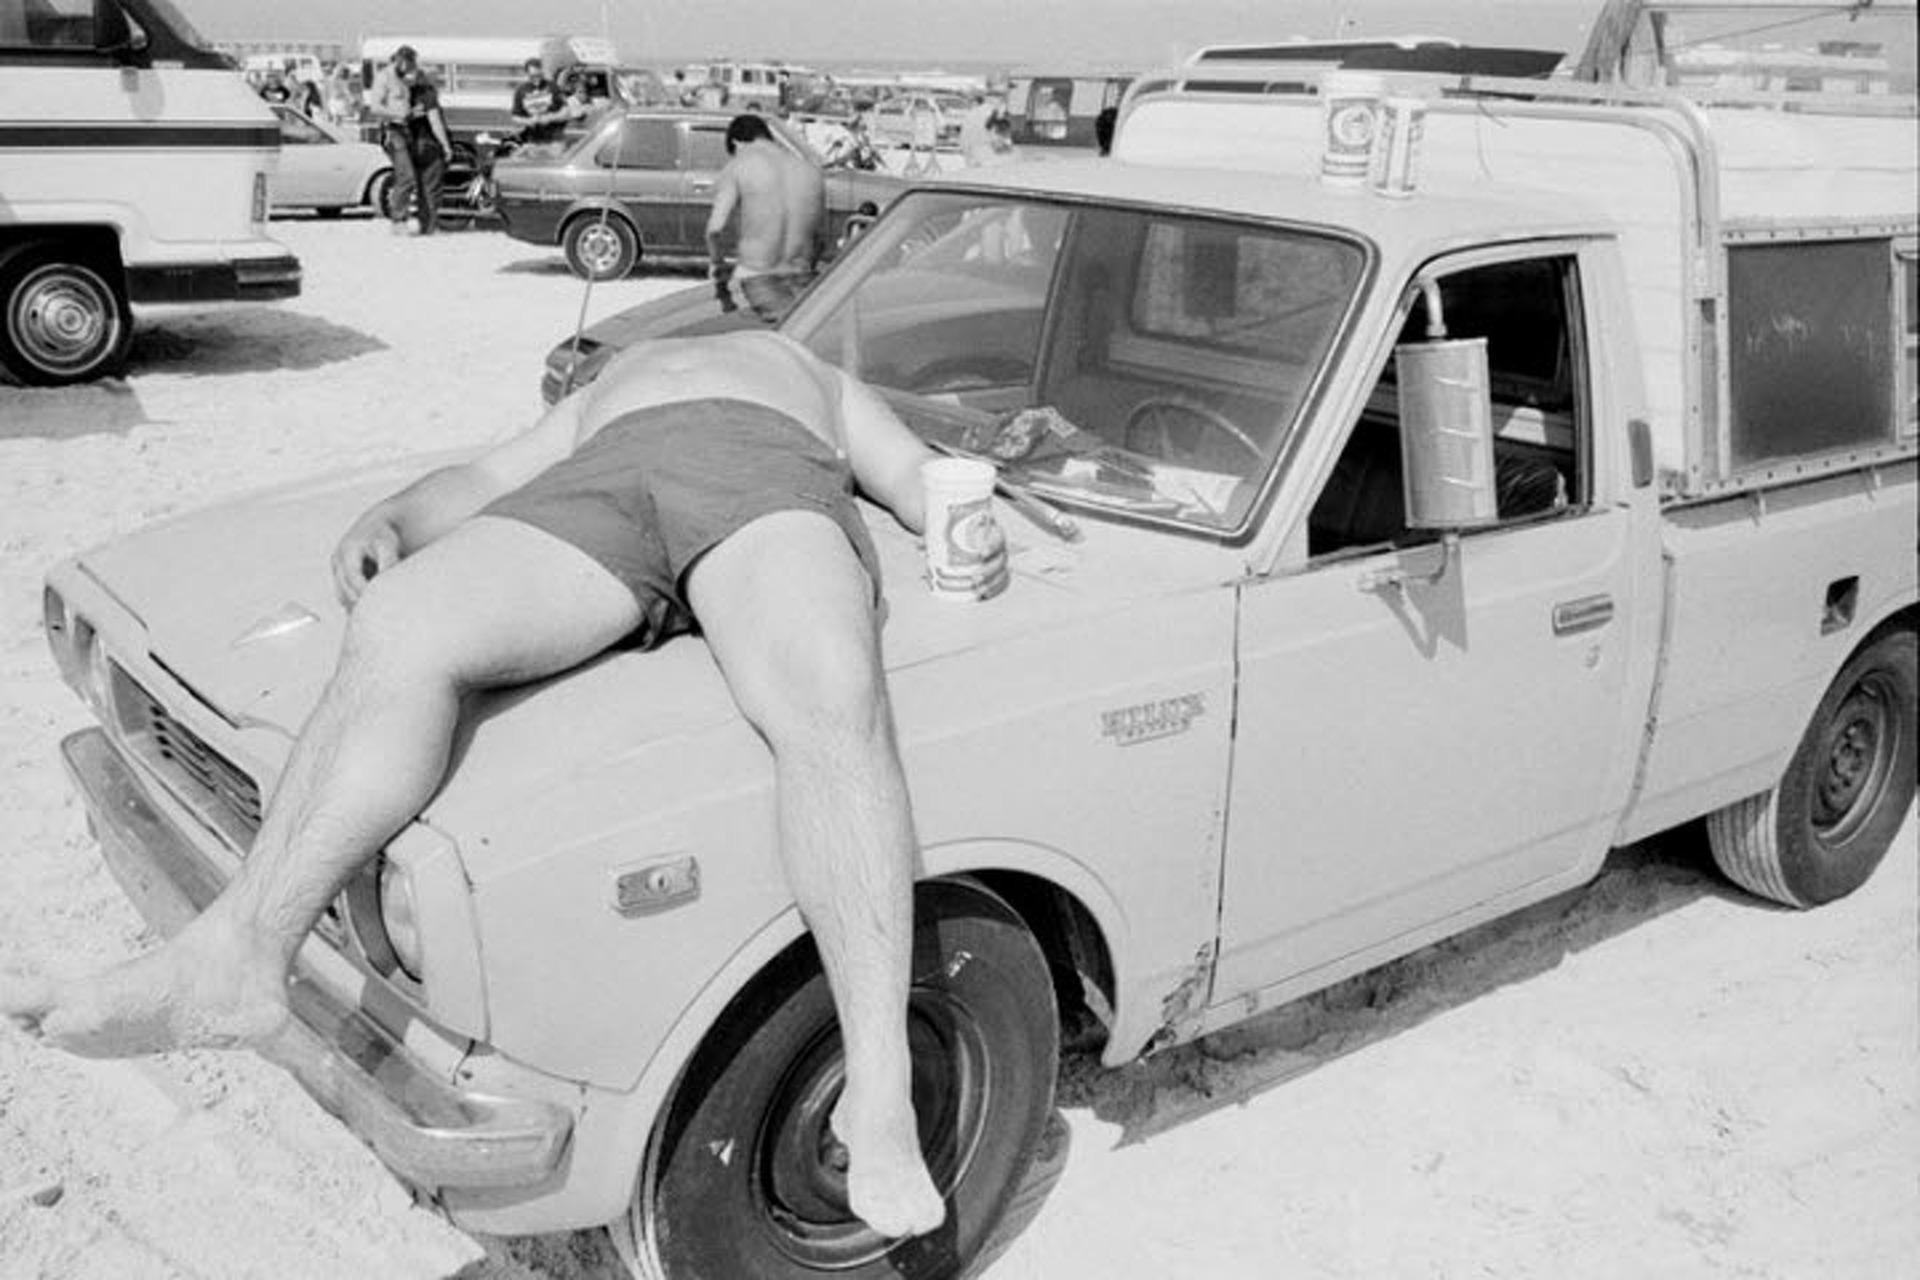 Spring Break 1984: The Last Time Regular Kids Drove Cool Cars